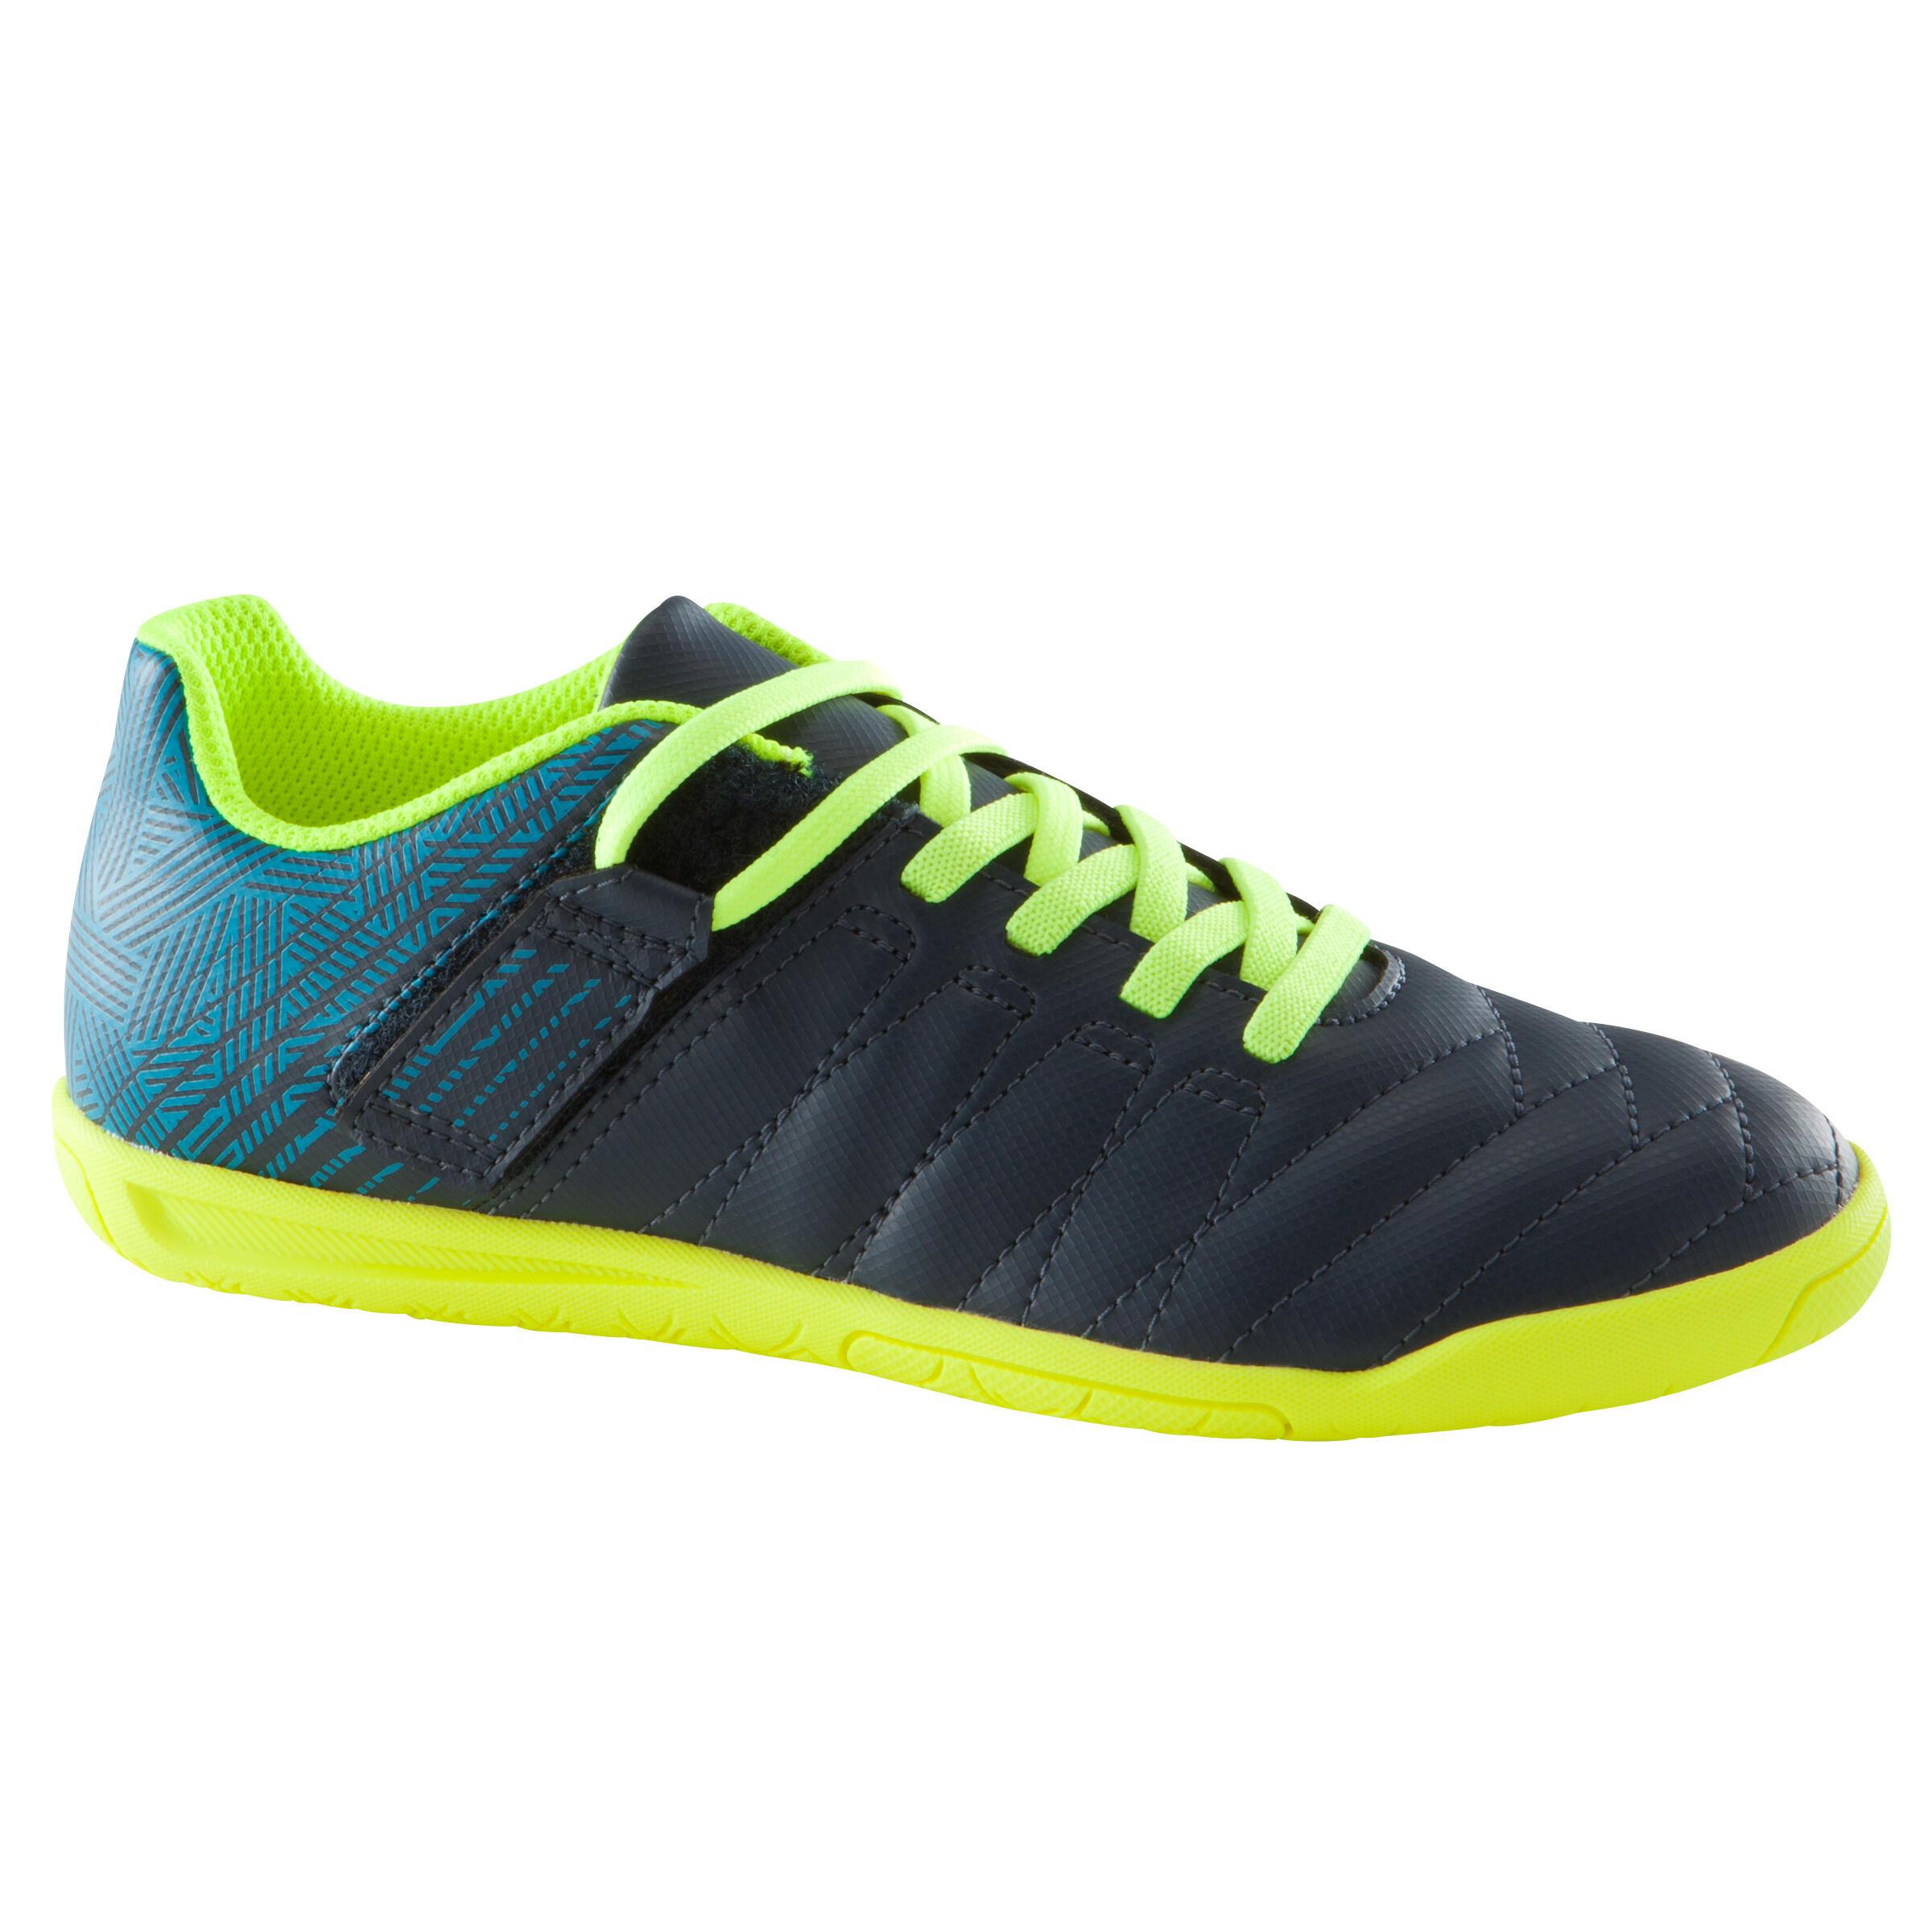 Kipsta Zaalvoetbalschoenen kind CLR 500 sala klittenband blauw/geel